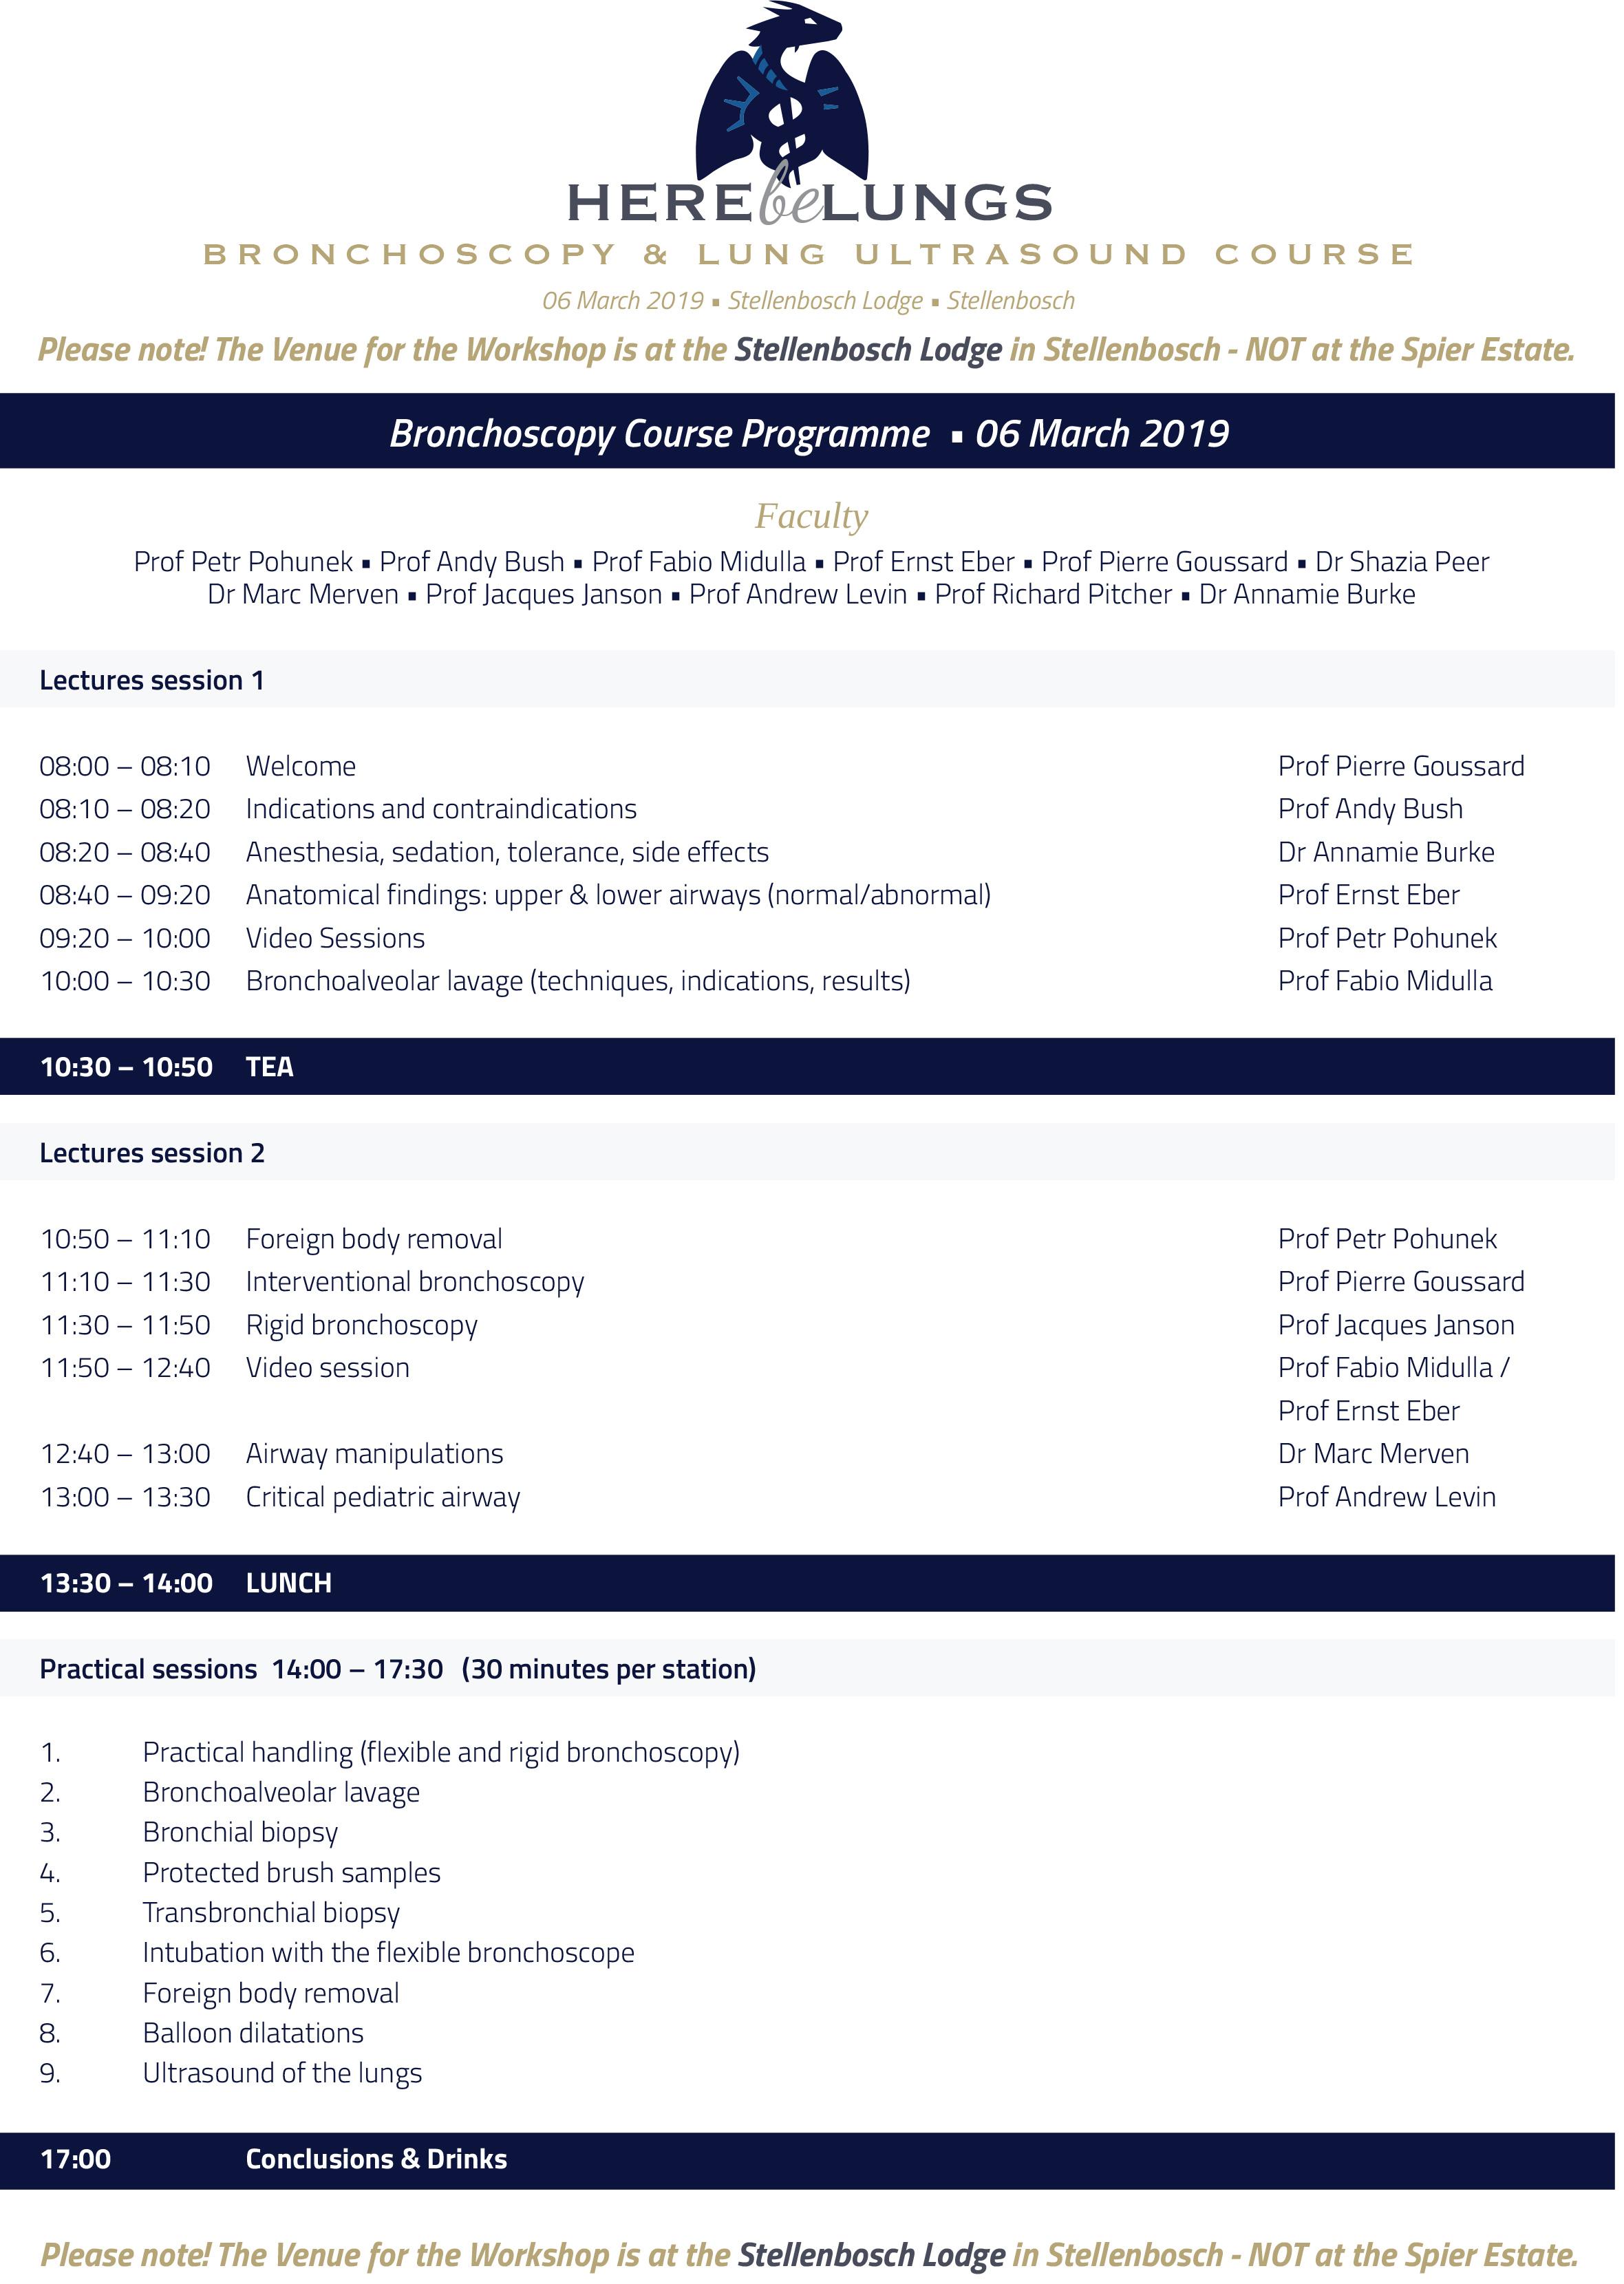 HBL_Bronchoscopy-Programme-2019